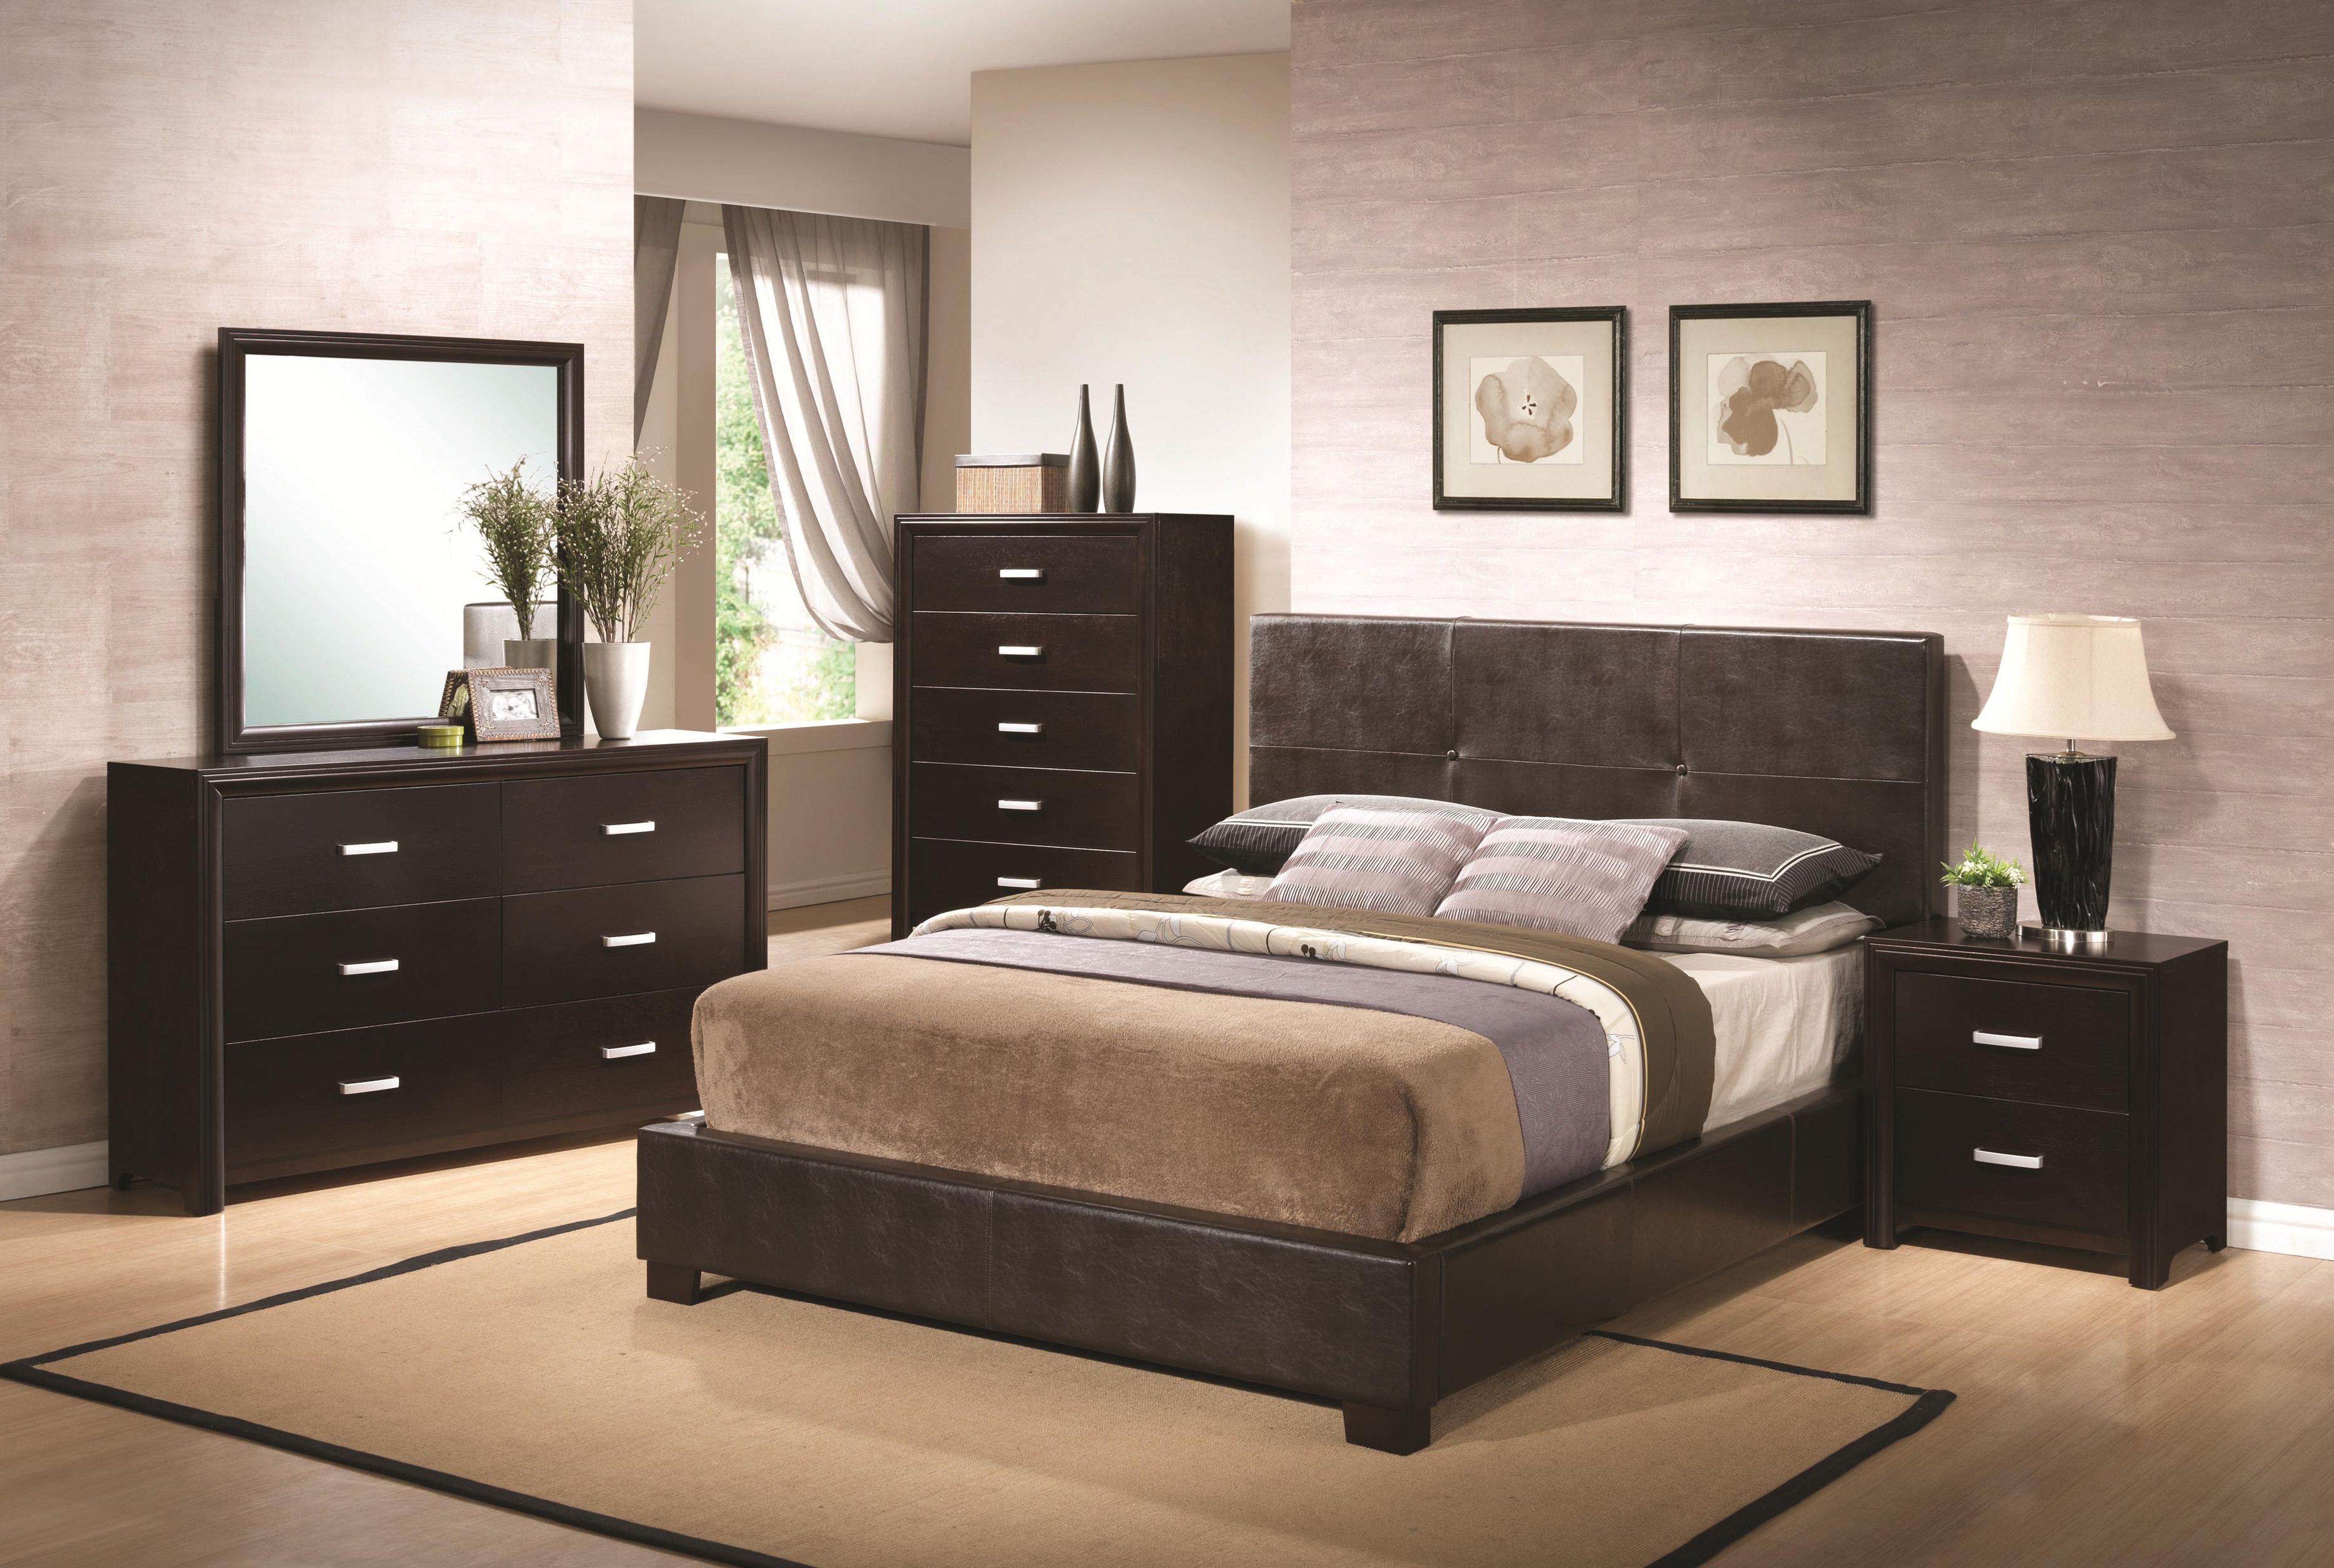 Bedroom Furniture Sets Ikea Hawk Haven